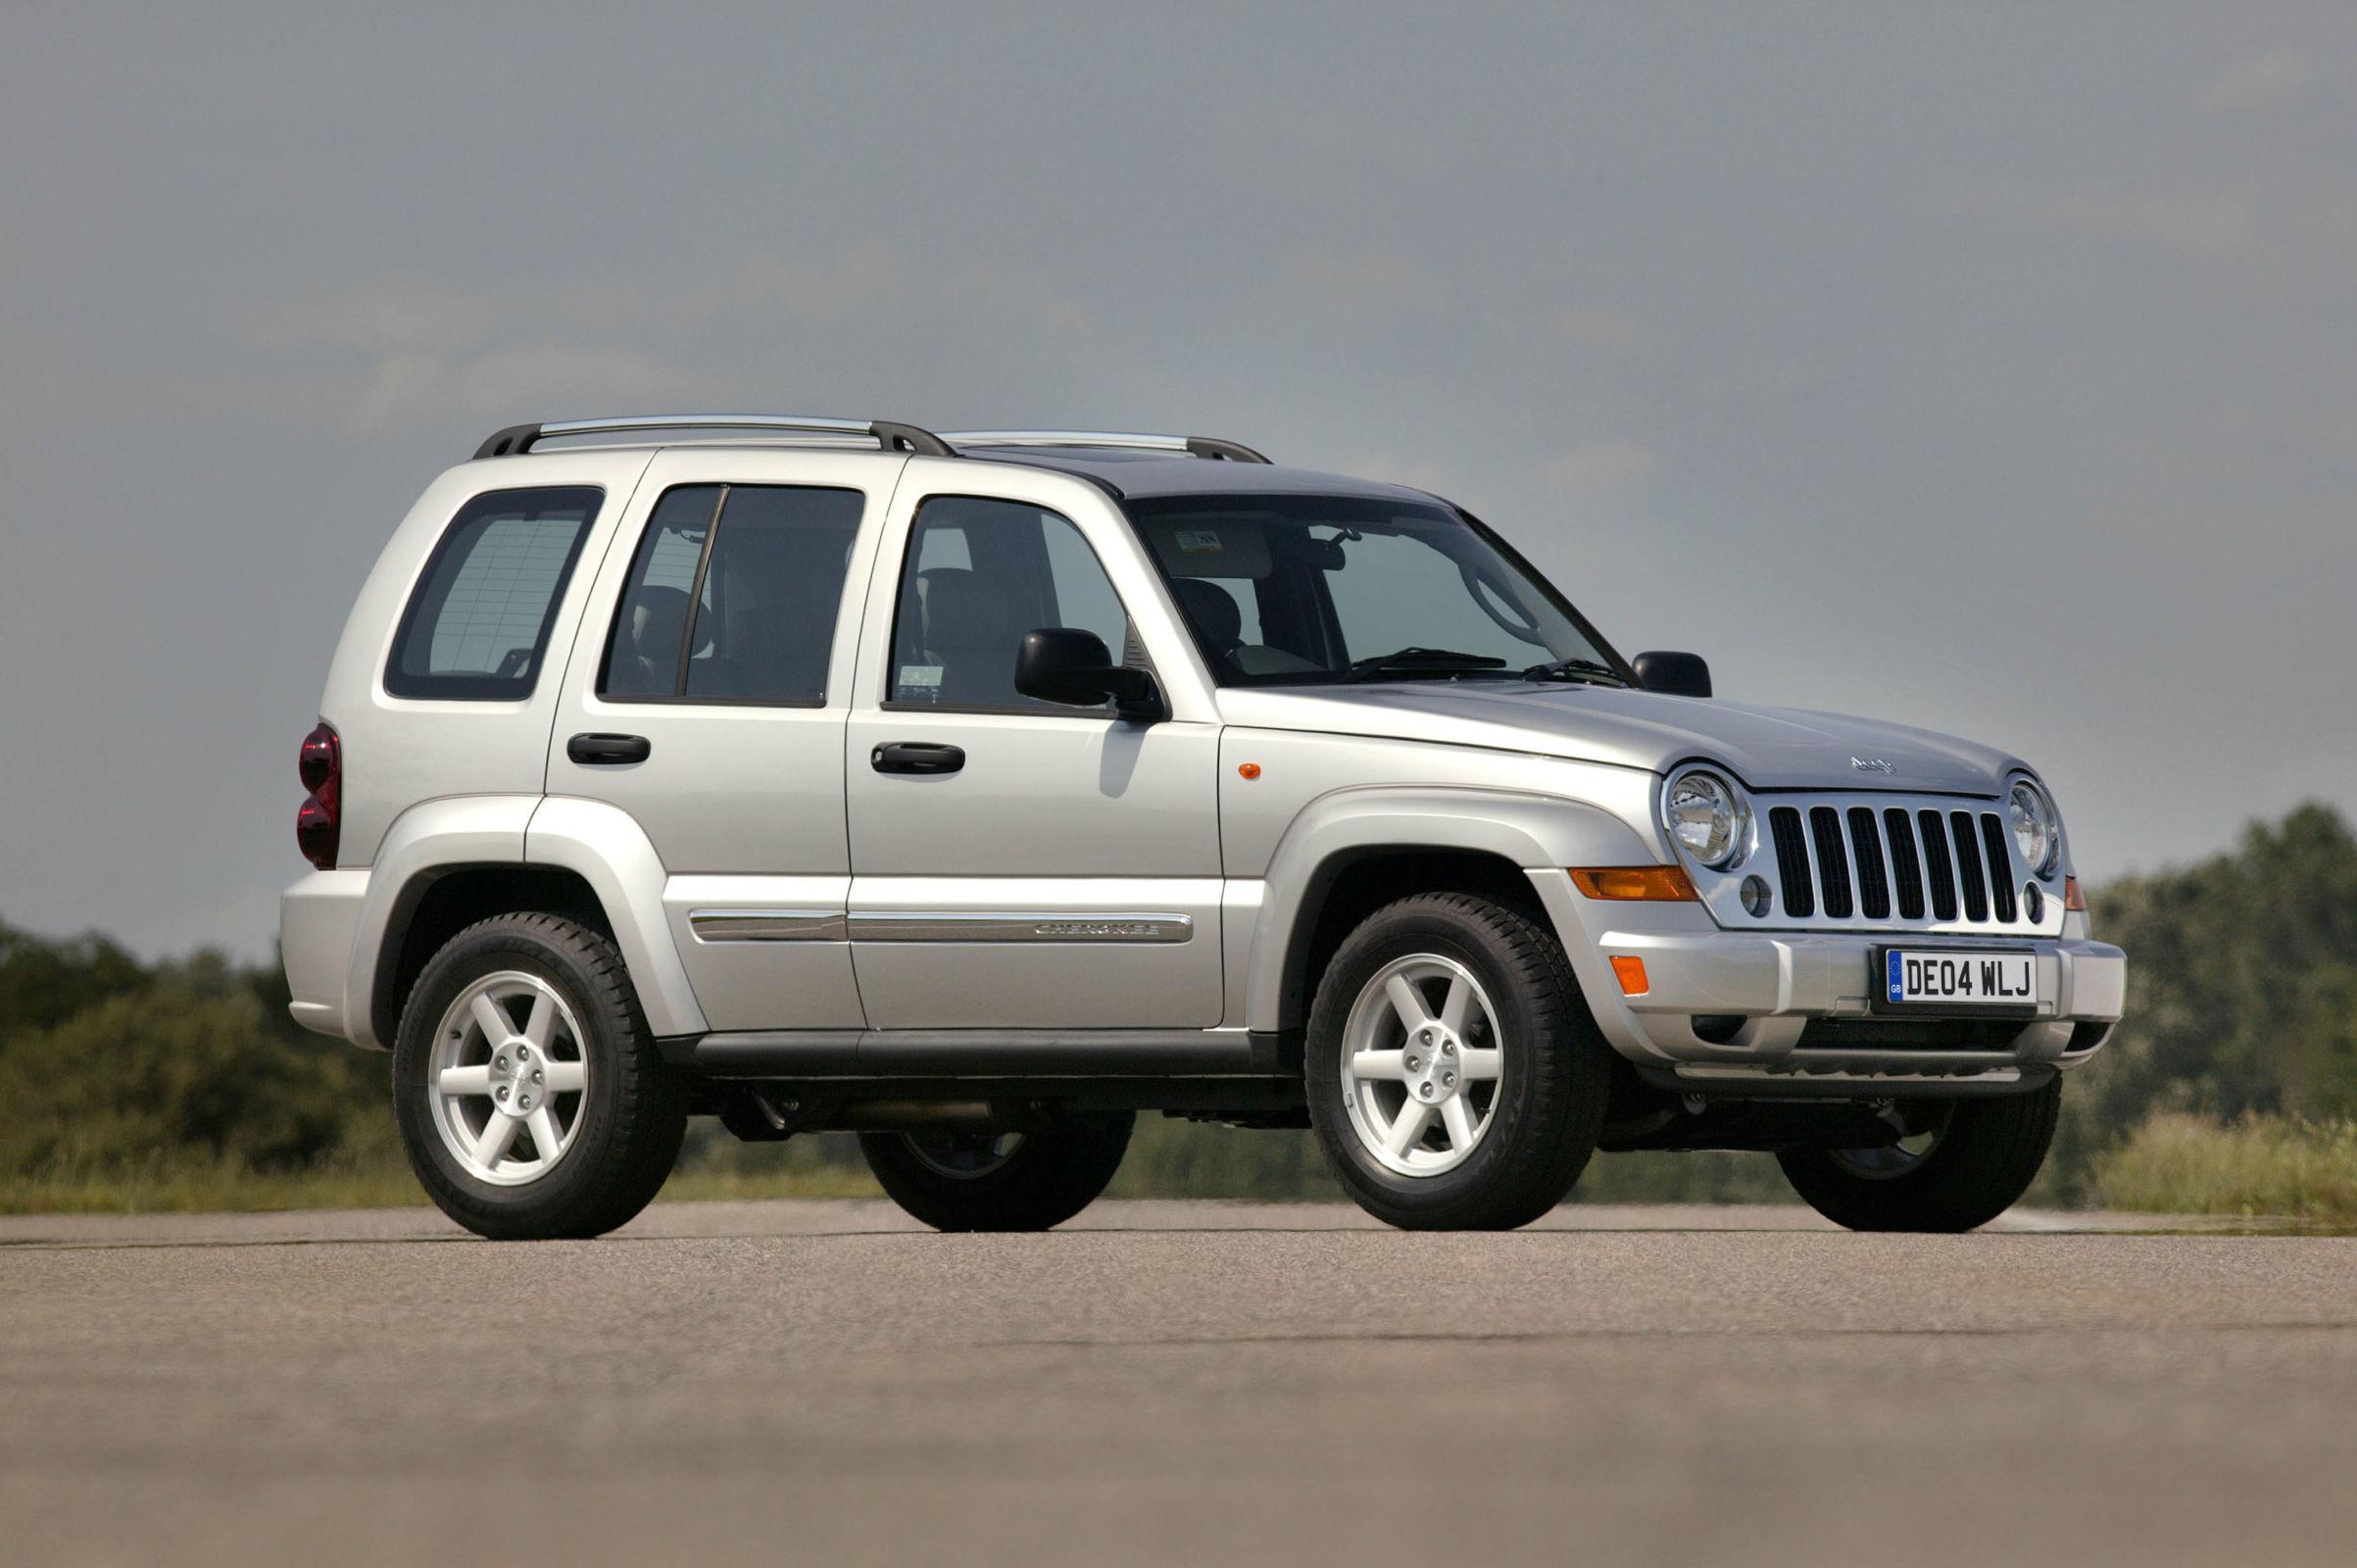 [Recall] Jeep Cherokee: Suspensão Pode Quebrar | AutoPapo